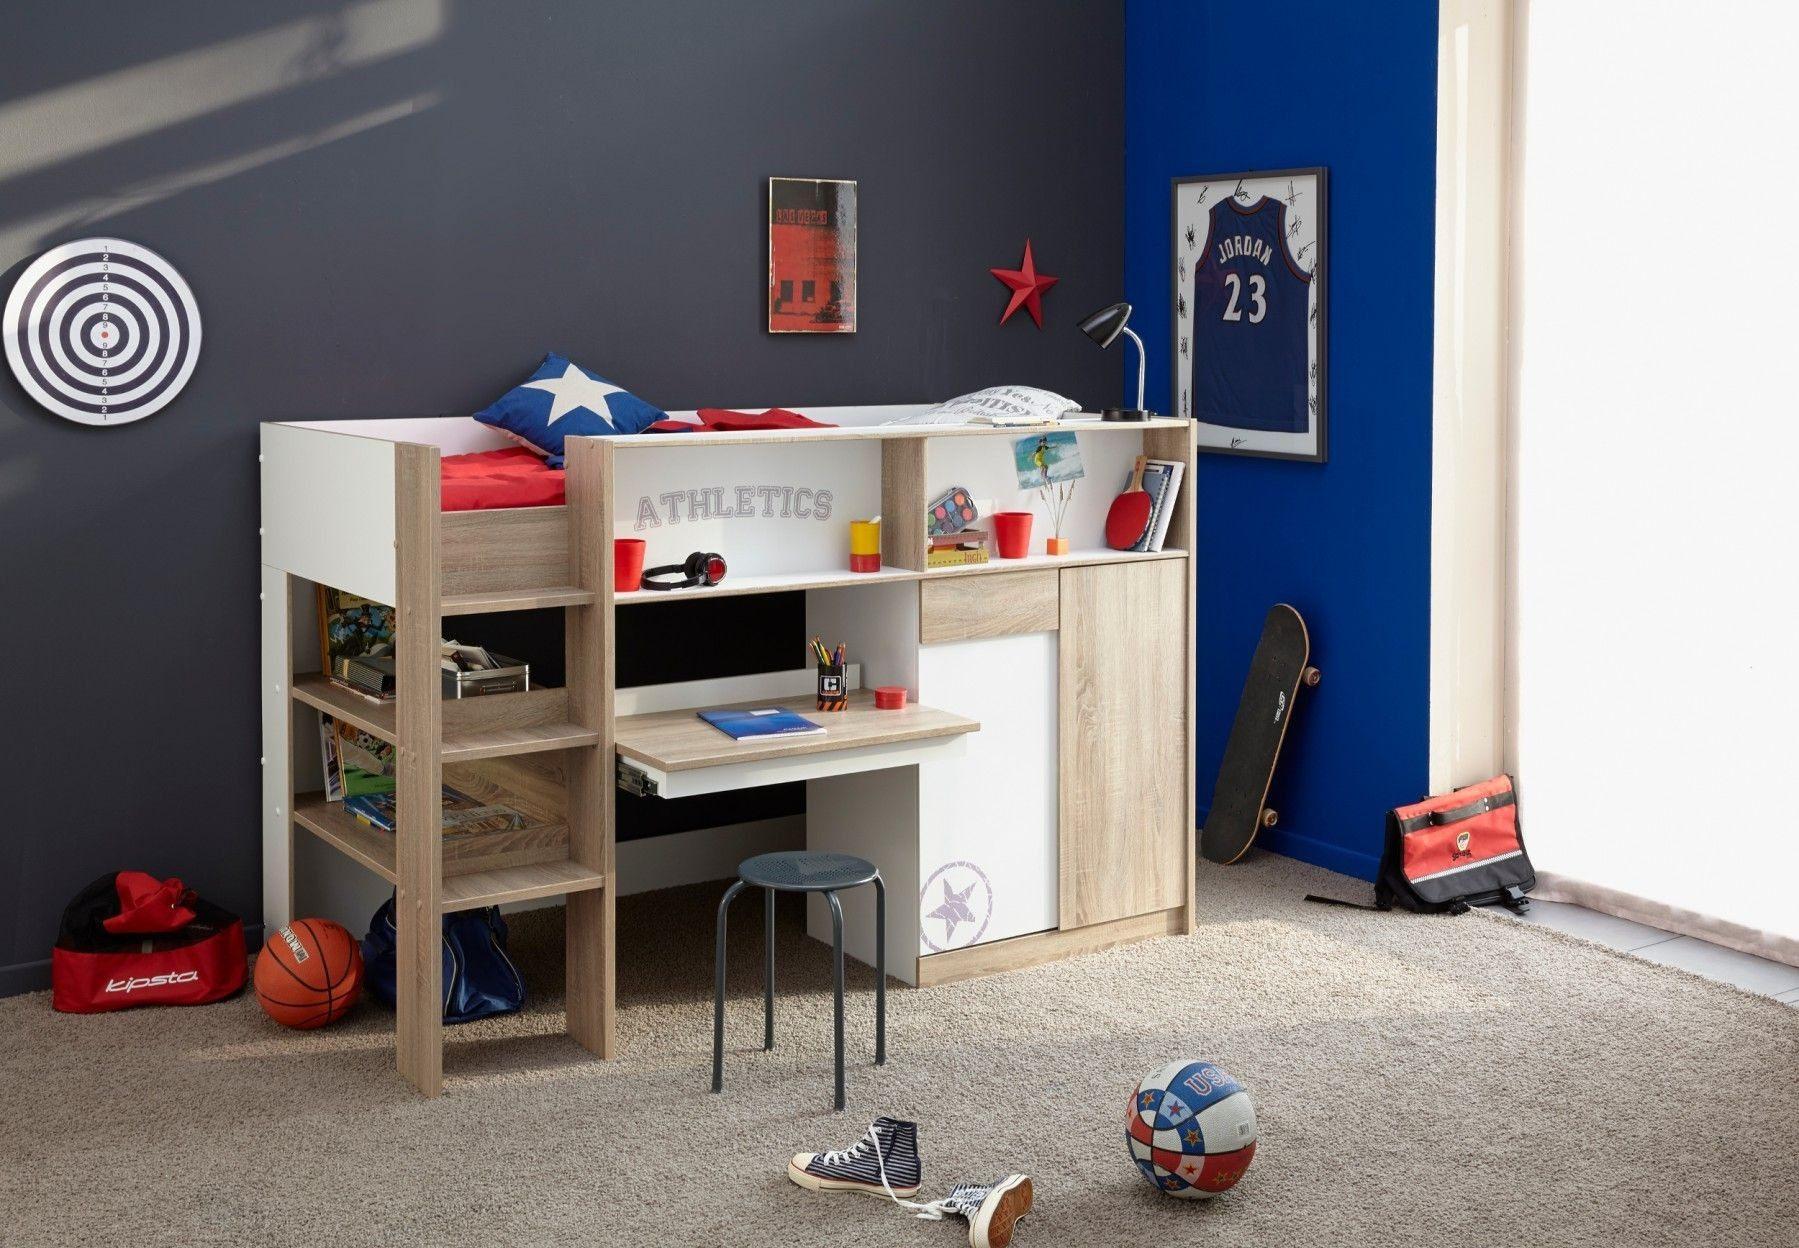 Lit Mezzanine Avec Bureau Intégré Nouveau 40 Inspirational Lit Superposé Bureau